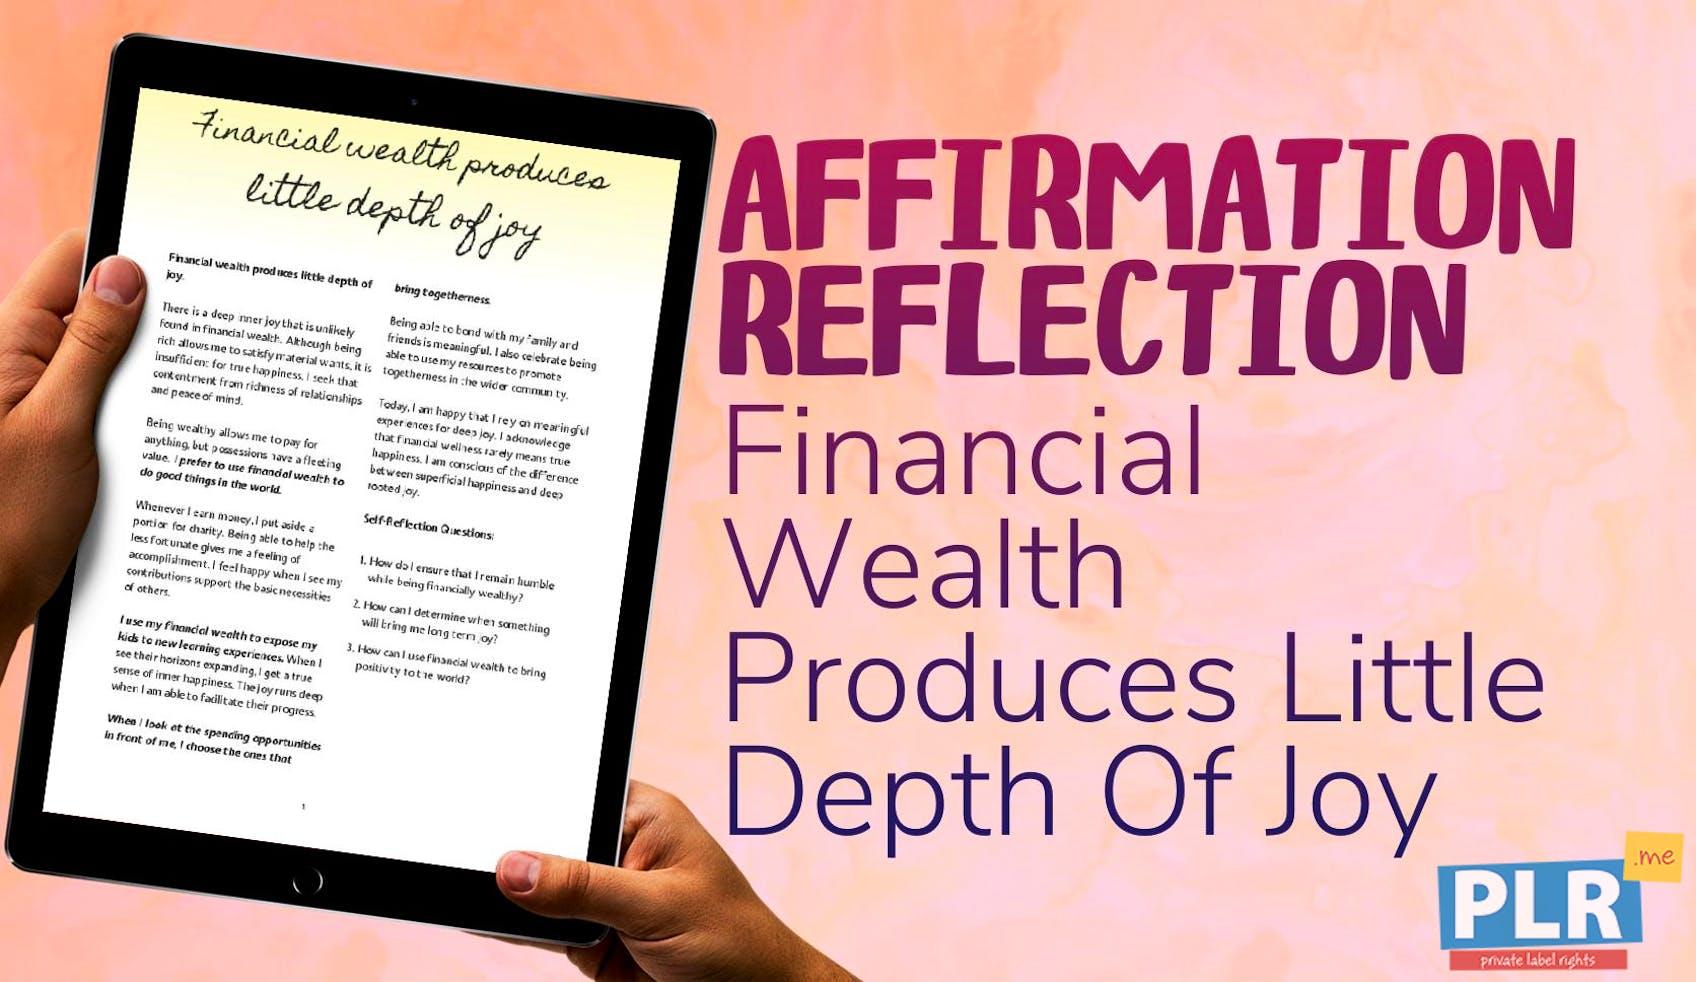 Financial Wealth Produces Little Depth Of Joy